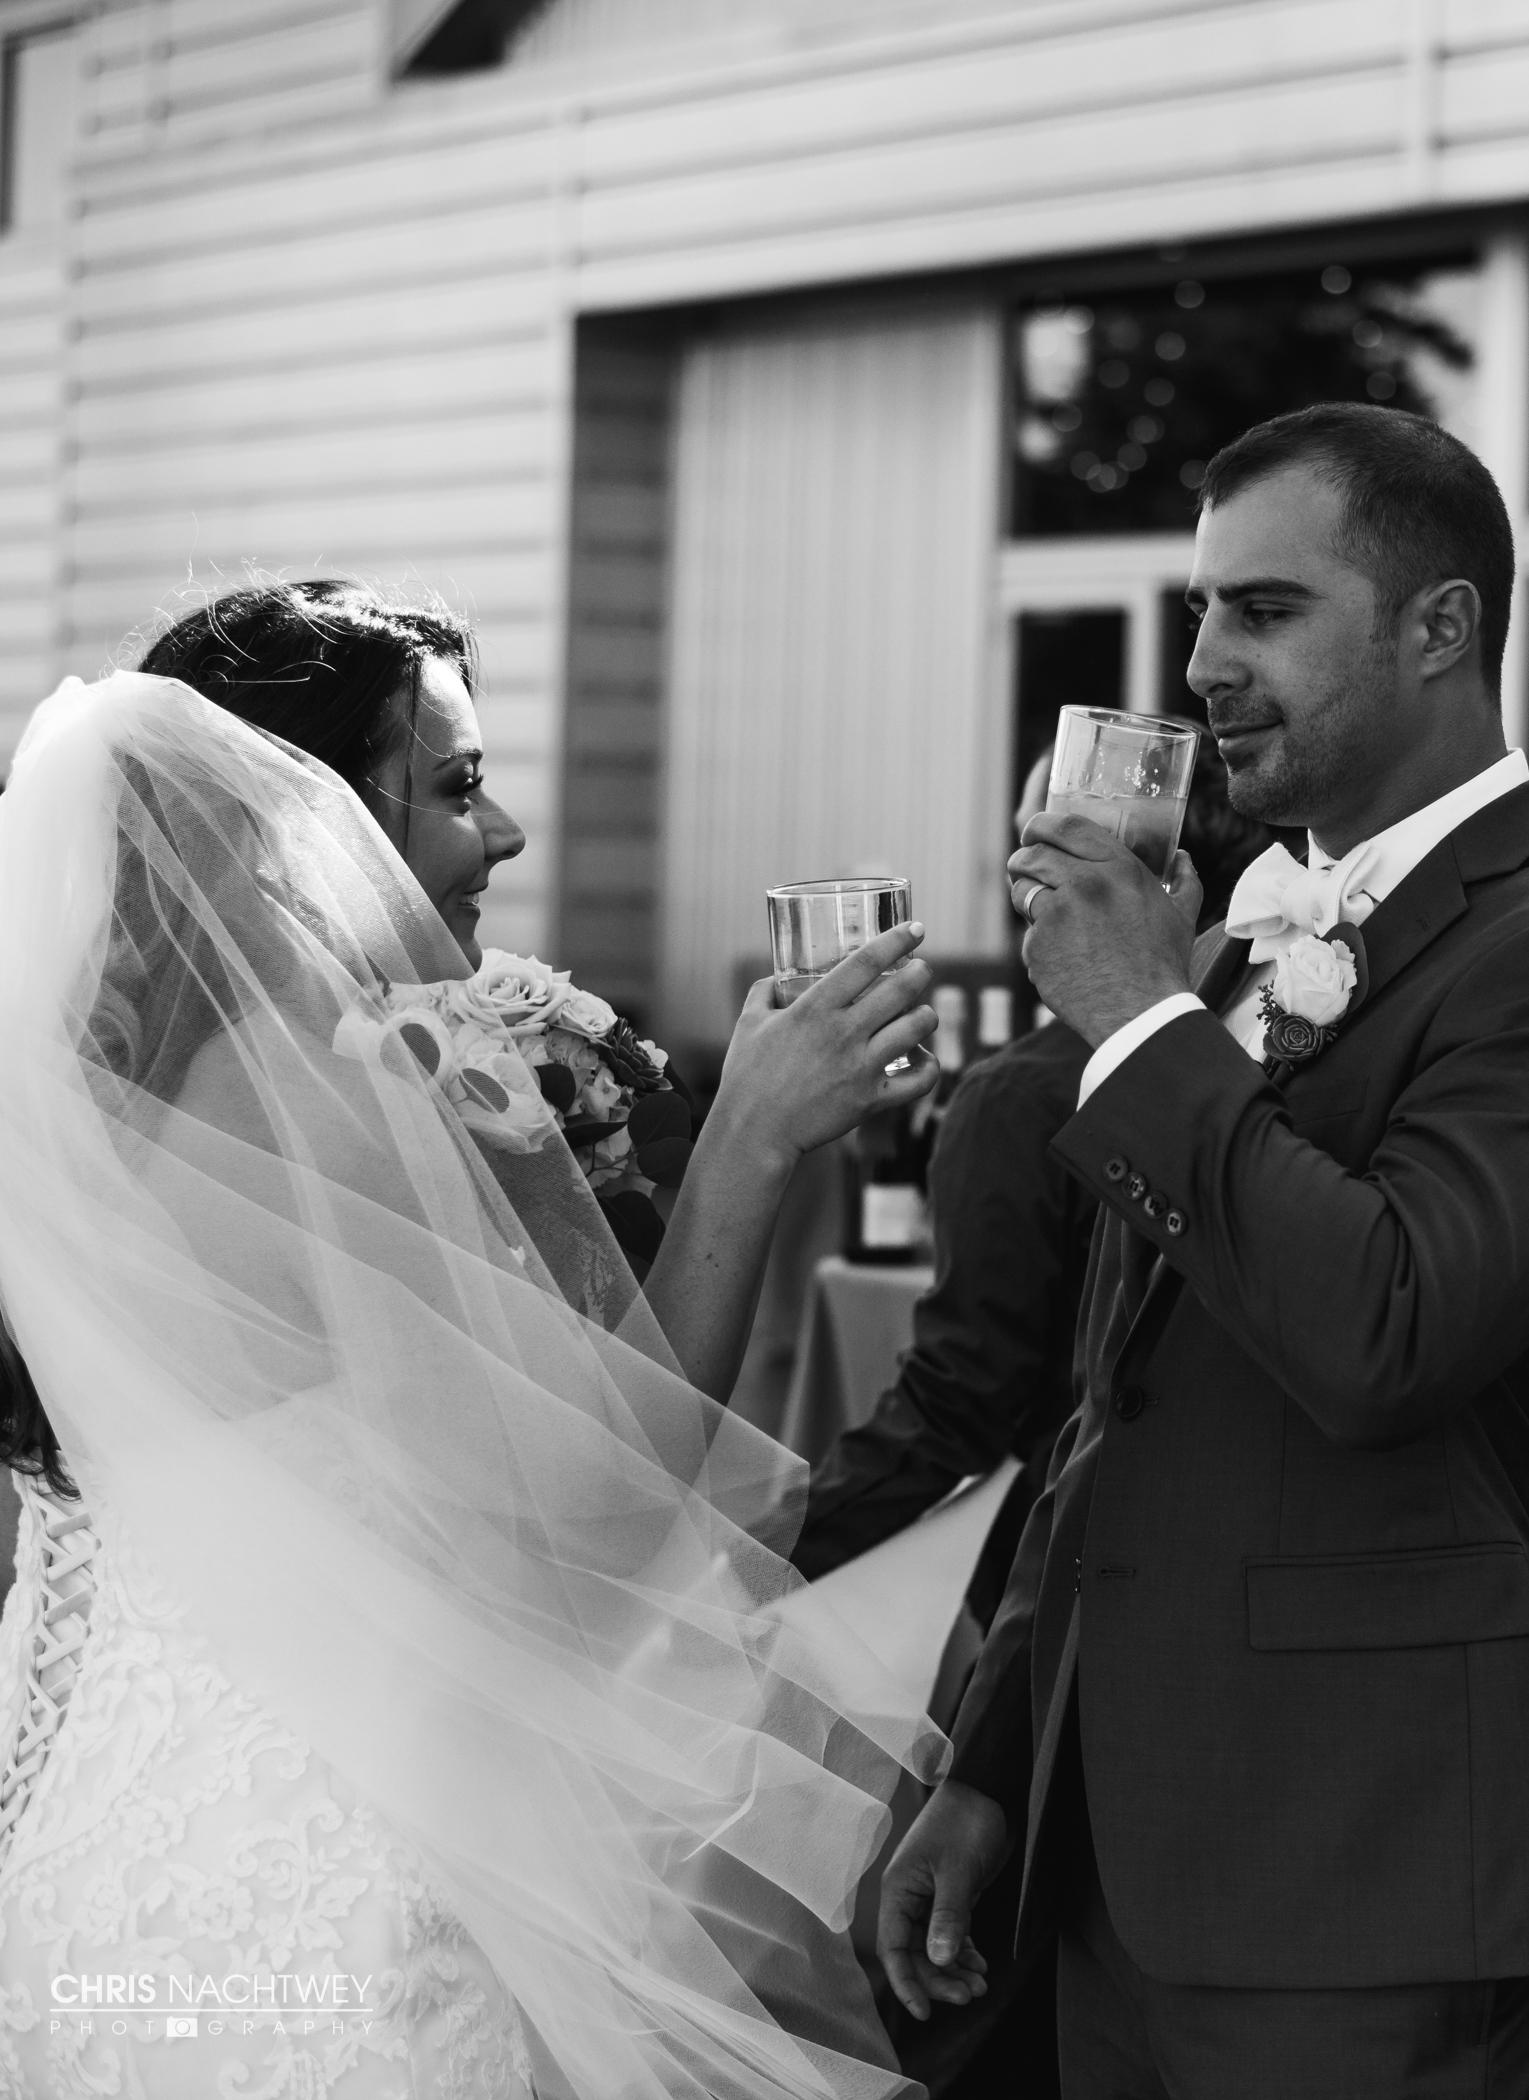 saltwater-farm-vineyard-wedding-photos-lindsay-gabe-chris-nachtwey-photography-2017-40.jpg